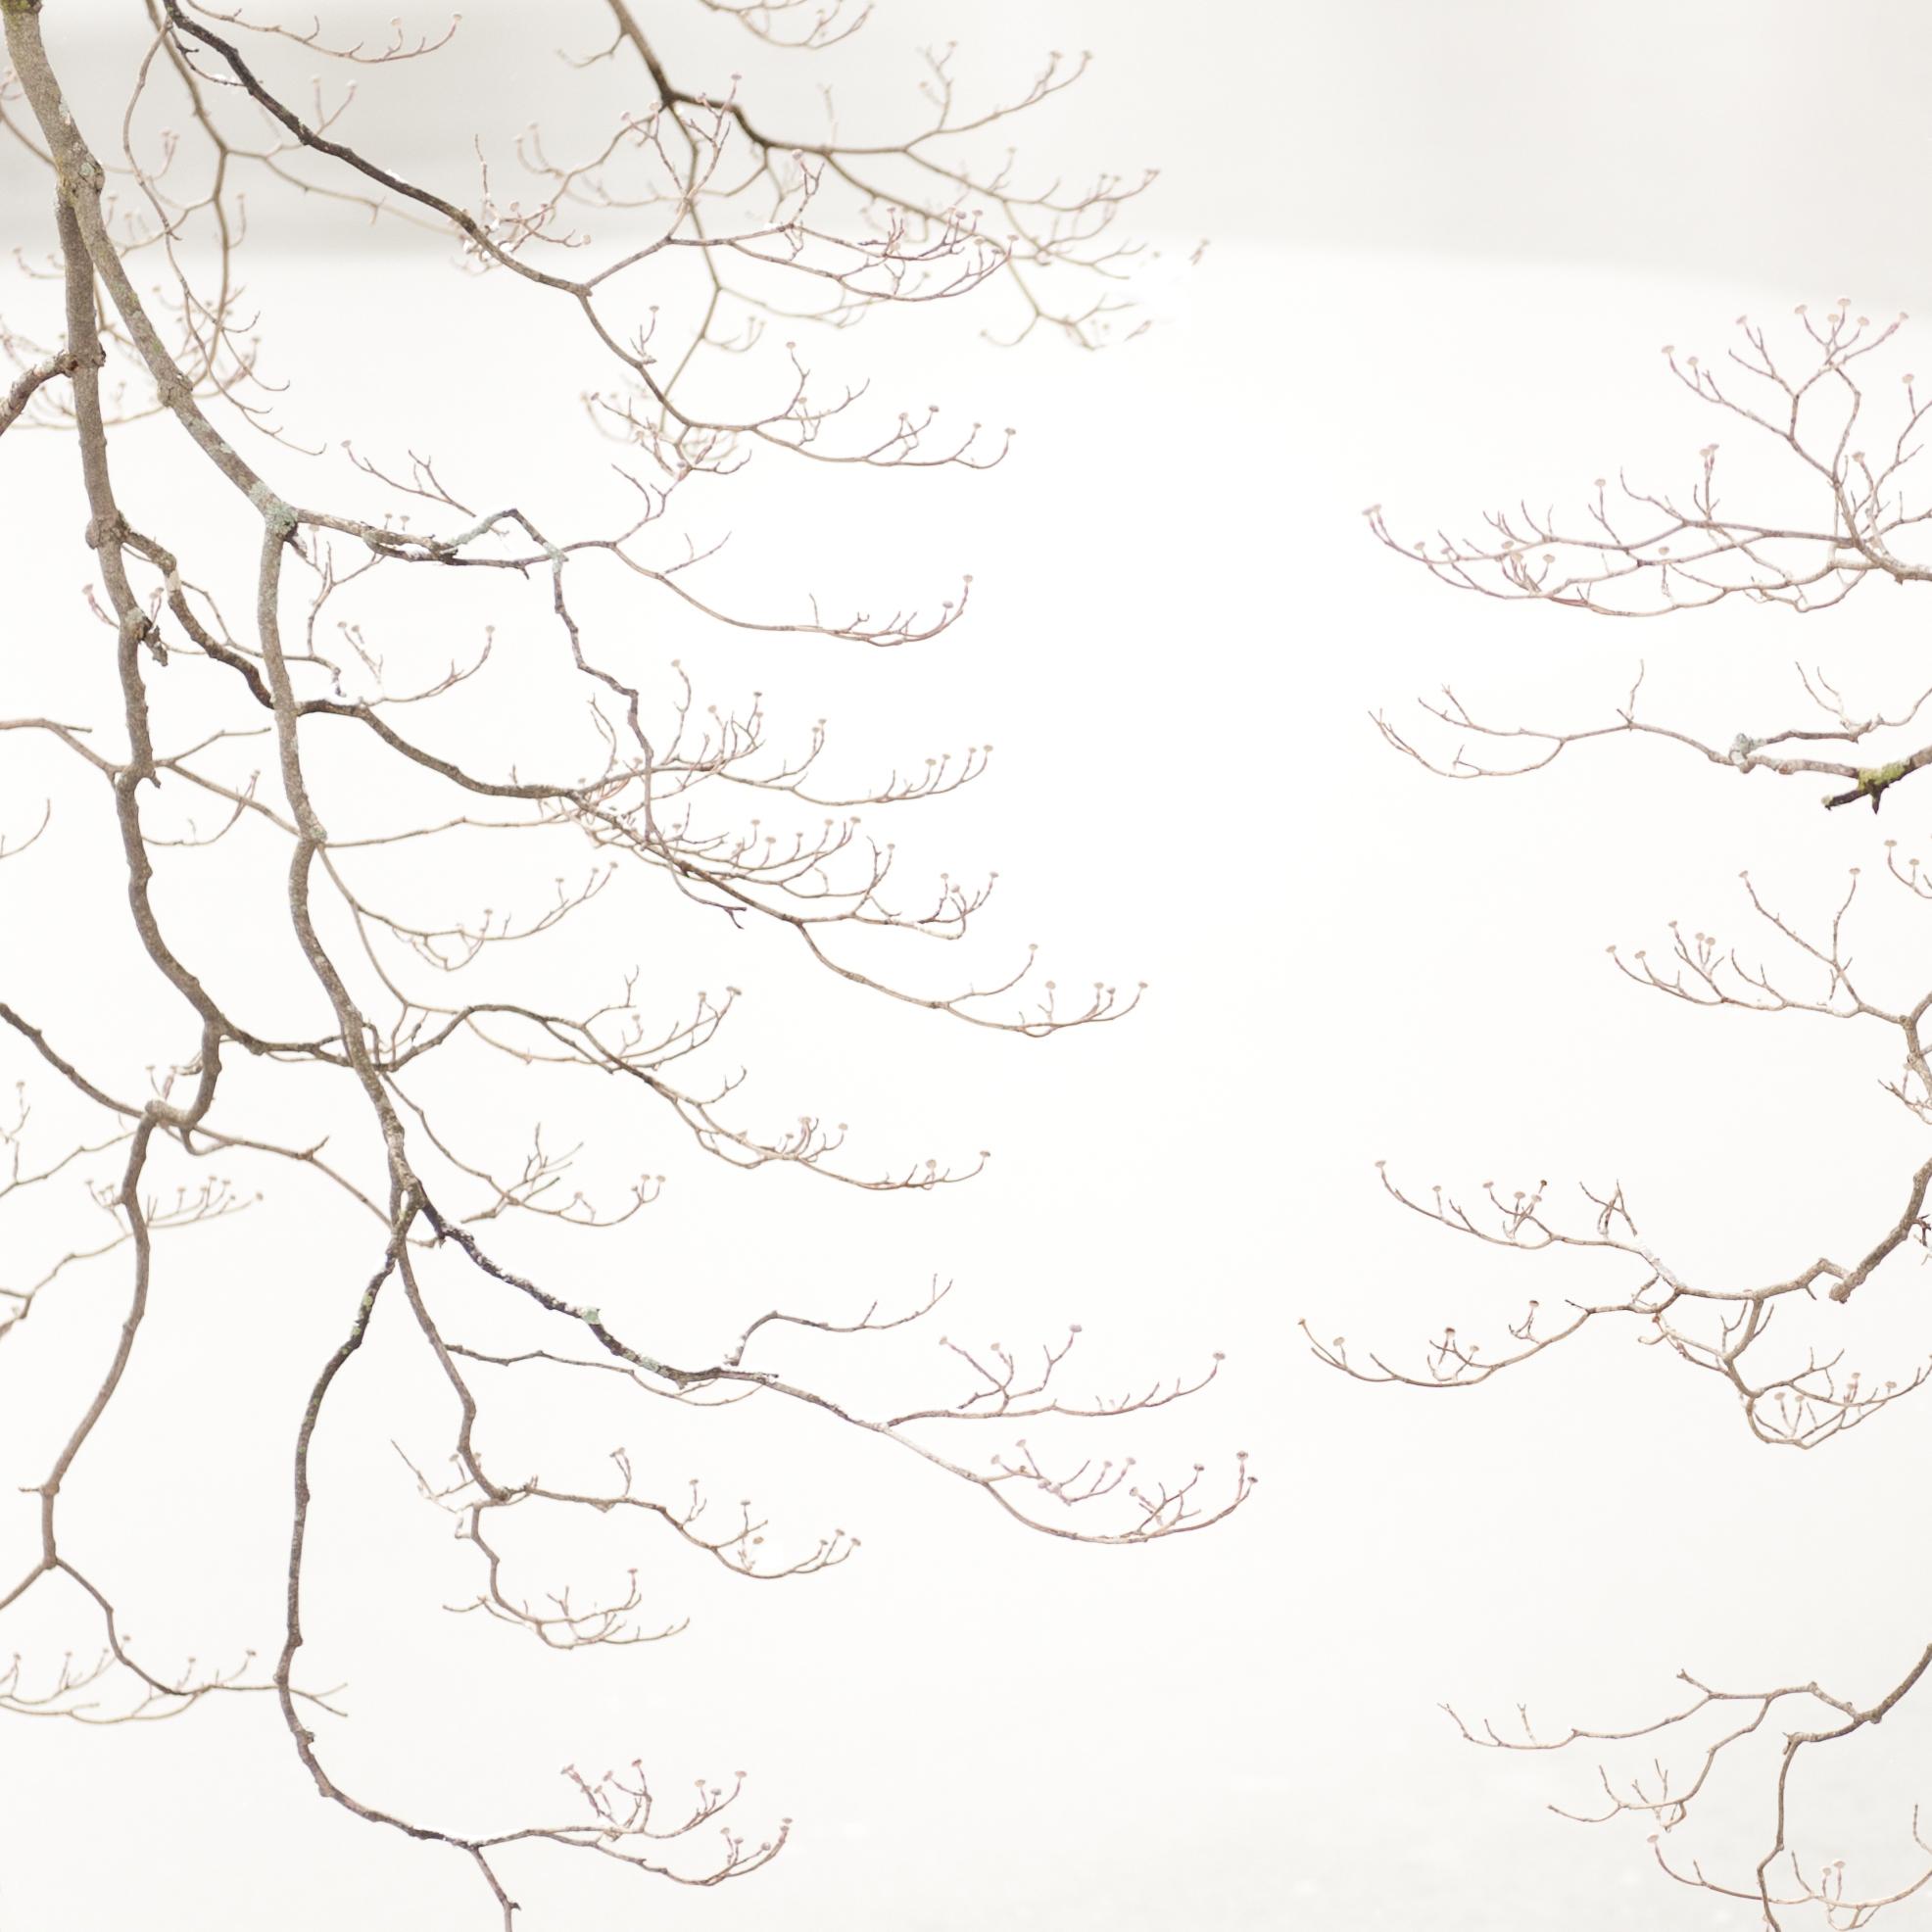 Study in Snow, Dogwood Tree, 5